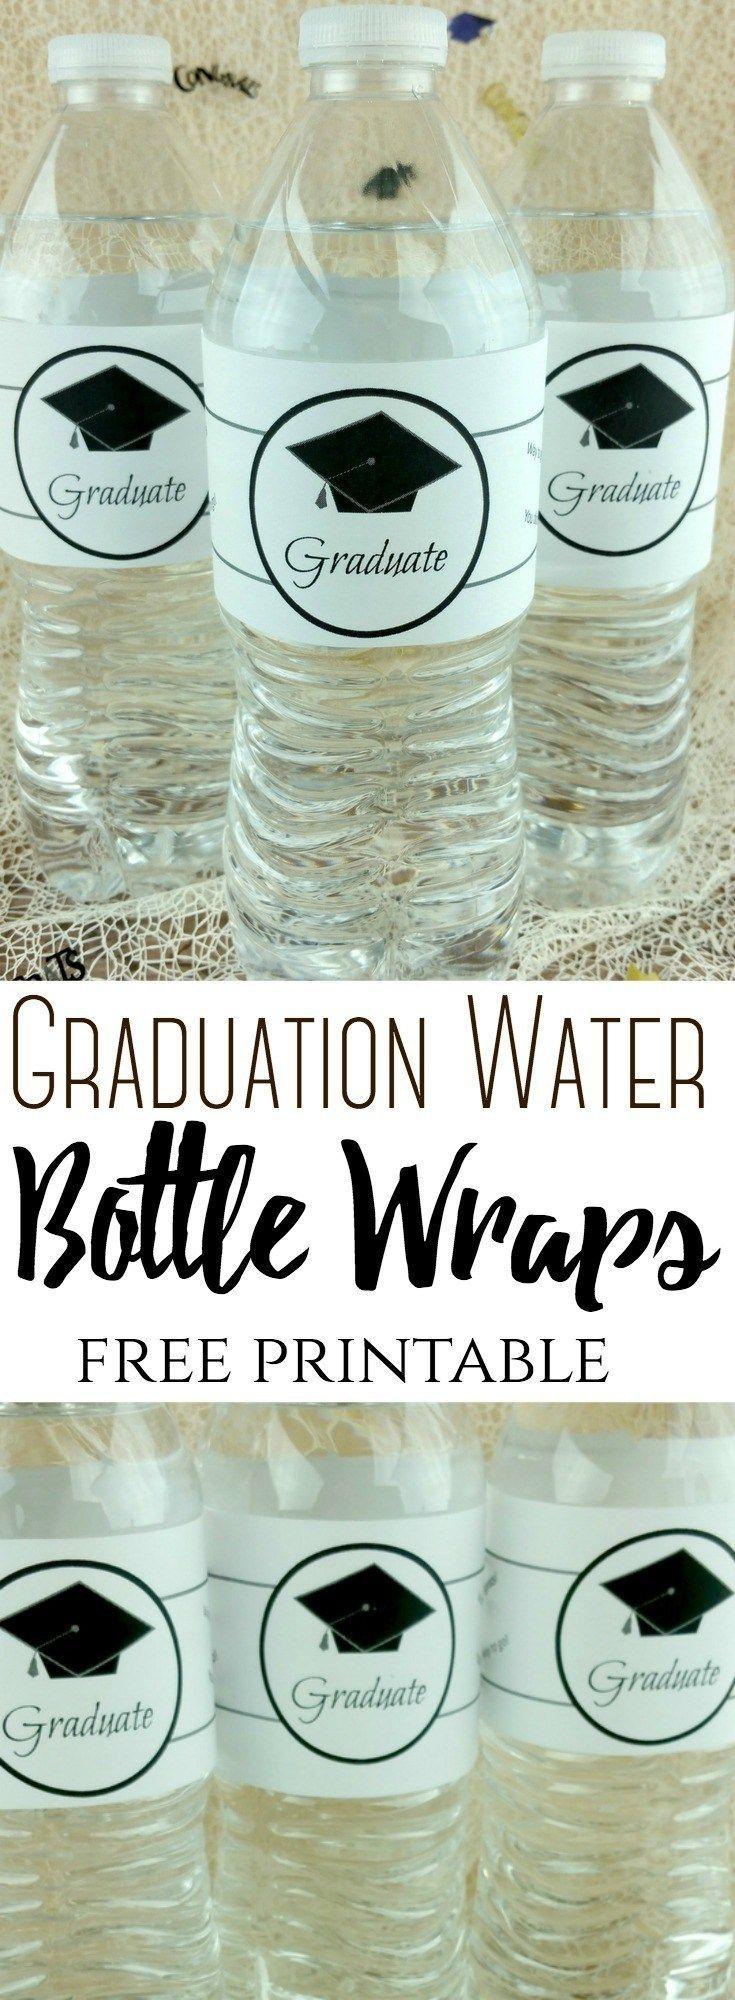 Graduation Water Bottle Wraps (Free Printable Label) #graduation - Free Printable Water Bottle Labels Graduation